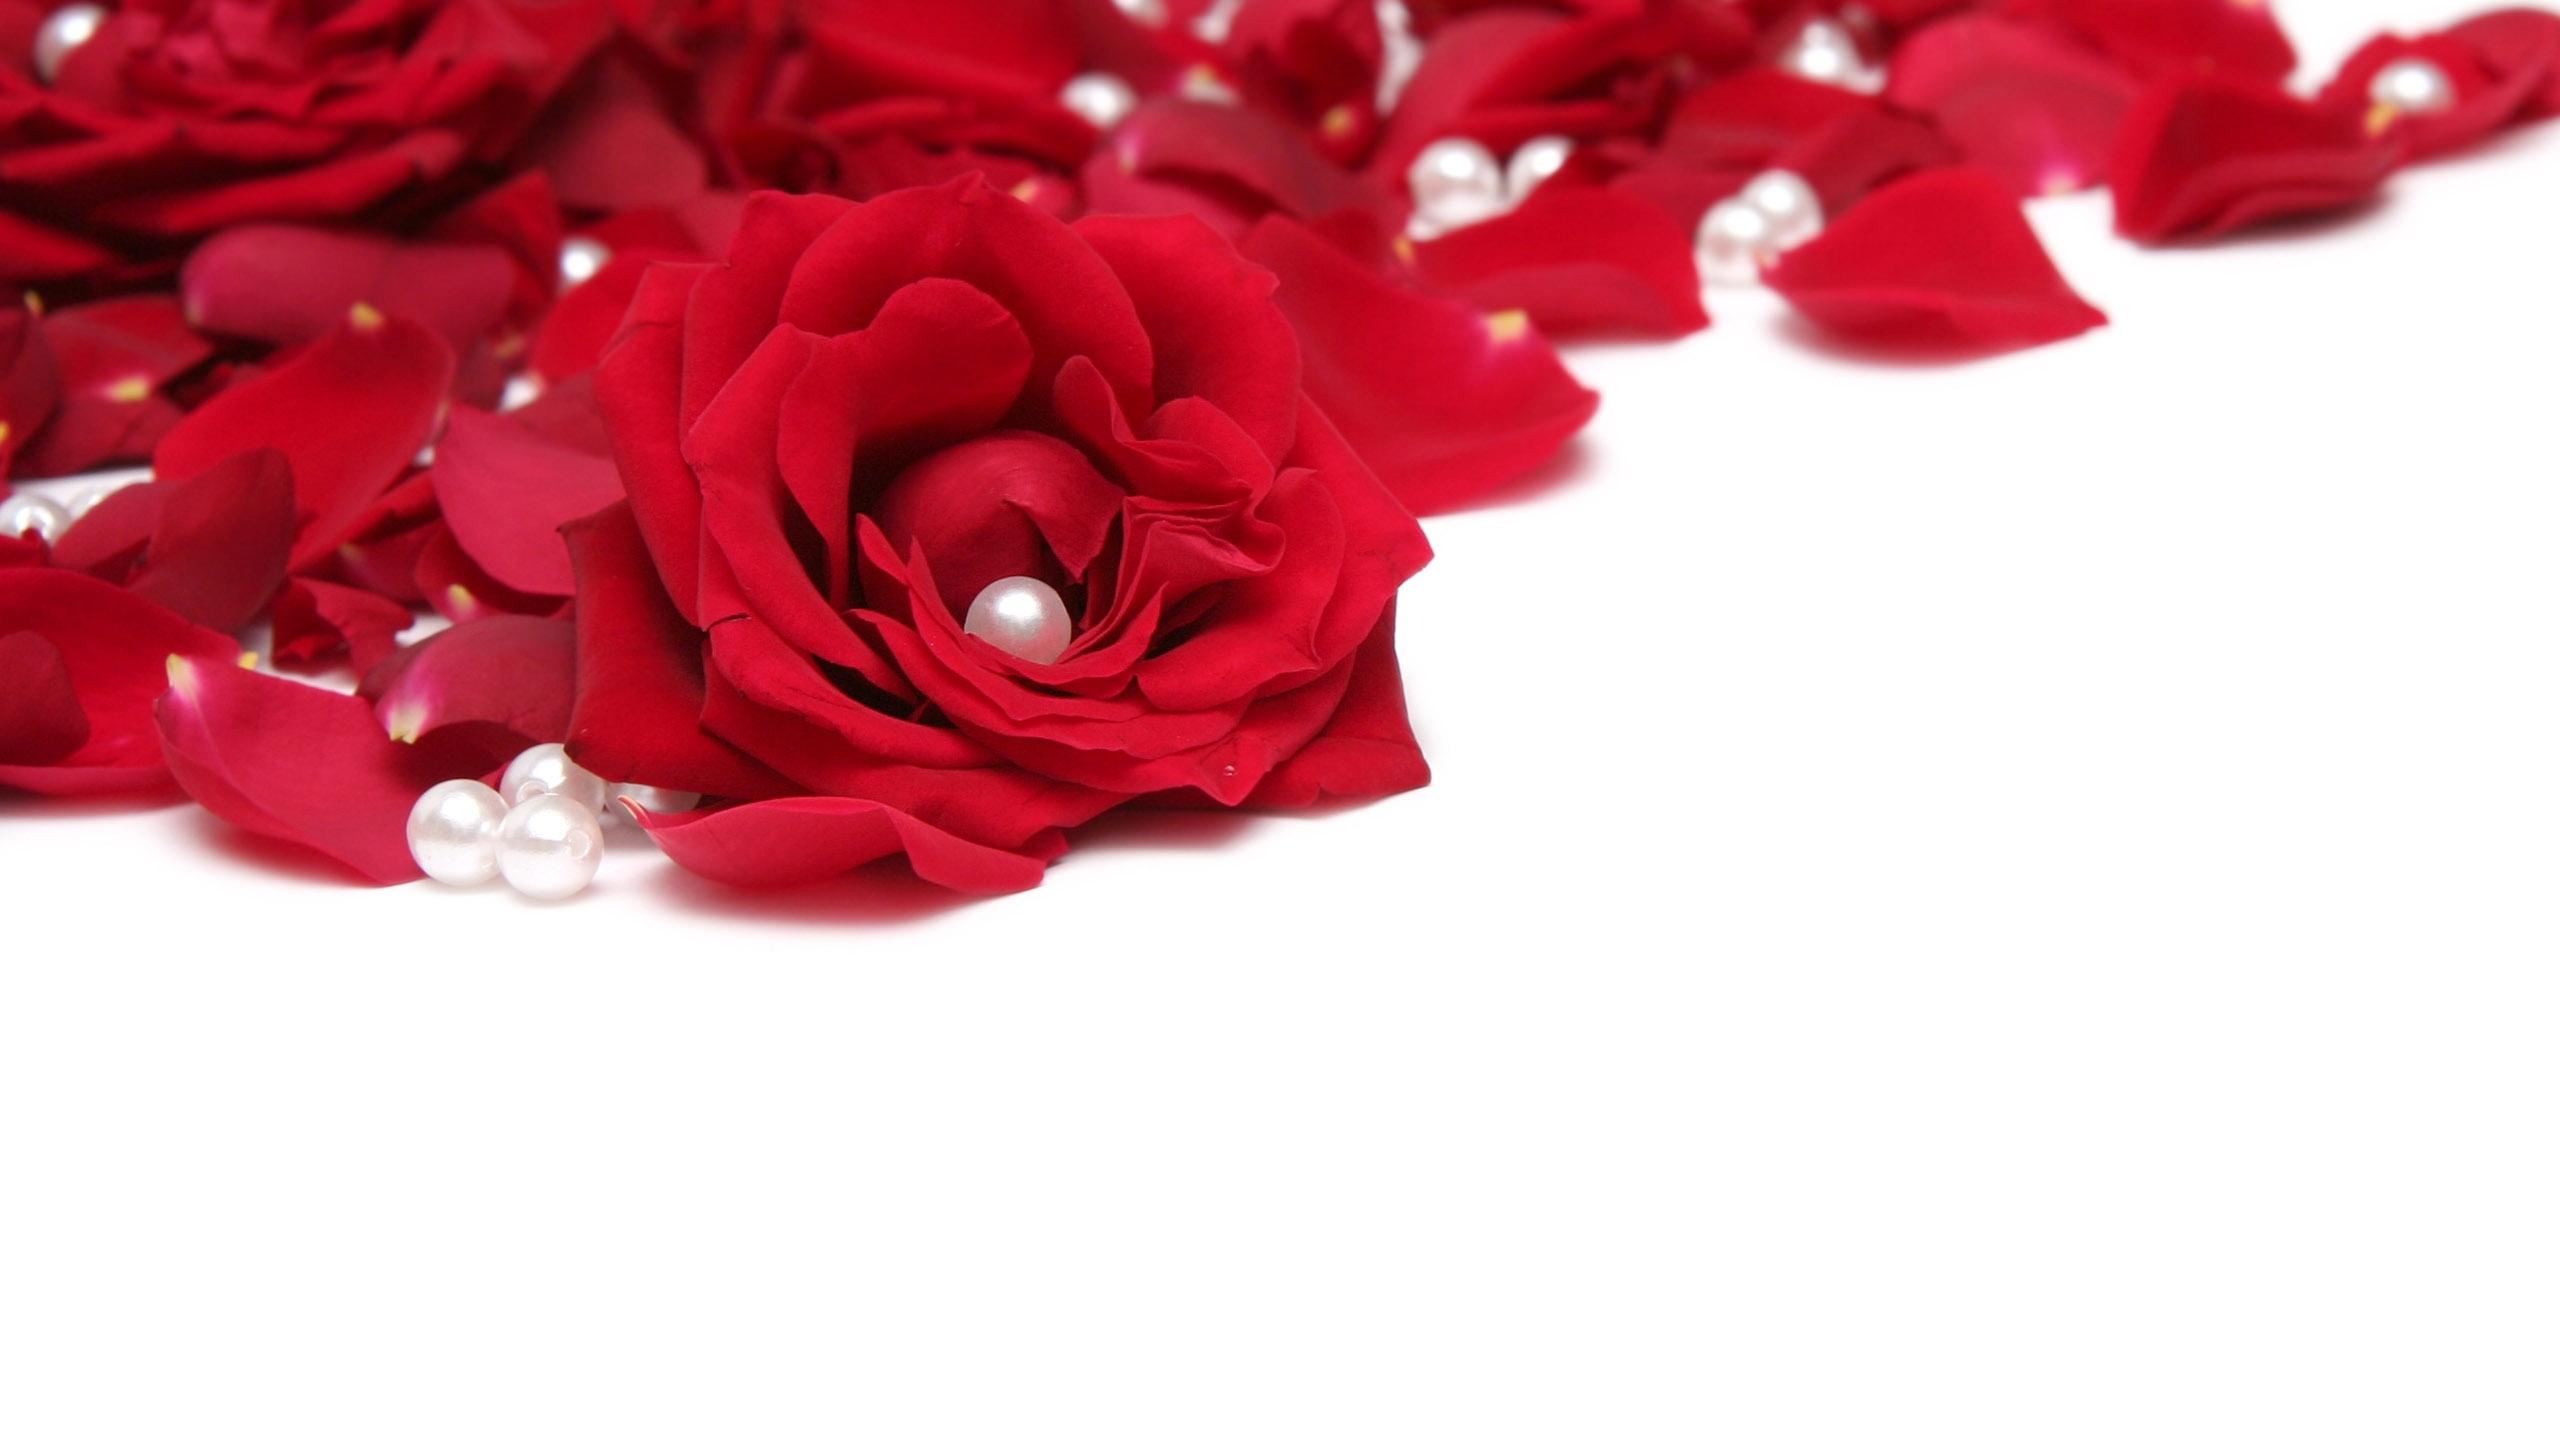 Wallpaper white red beads valentines day flower petal white red rose beads valentines day flower plant petal flowering plant floristry garden roses rose family mightylinksfo